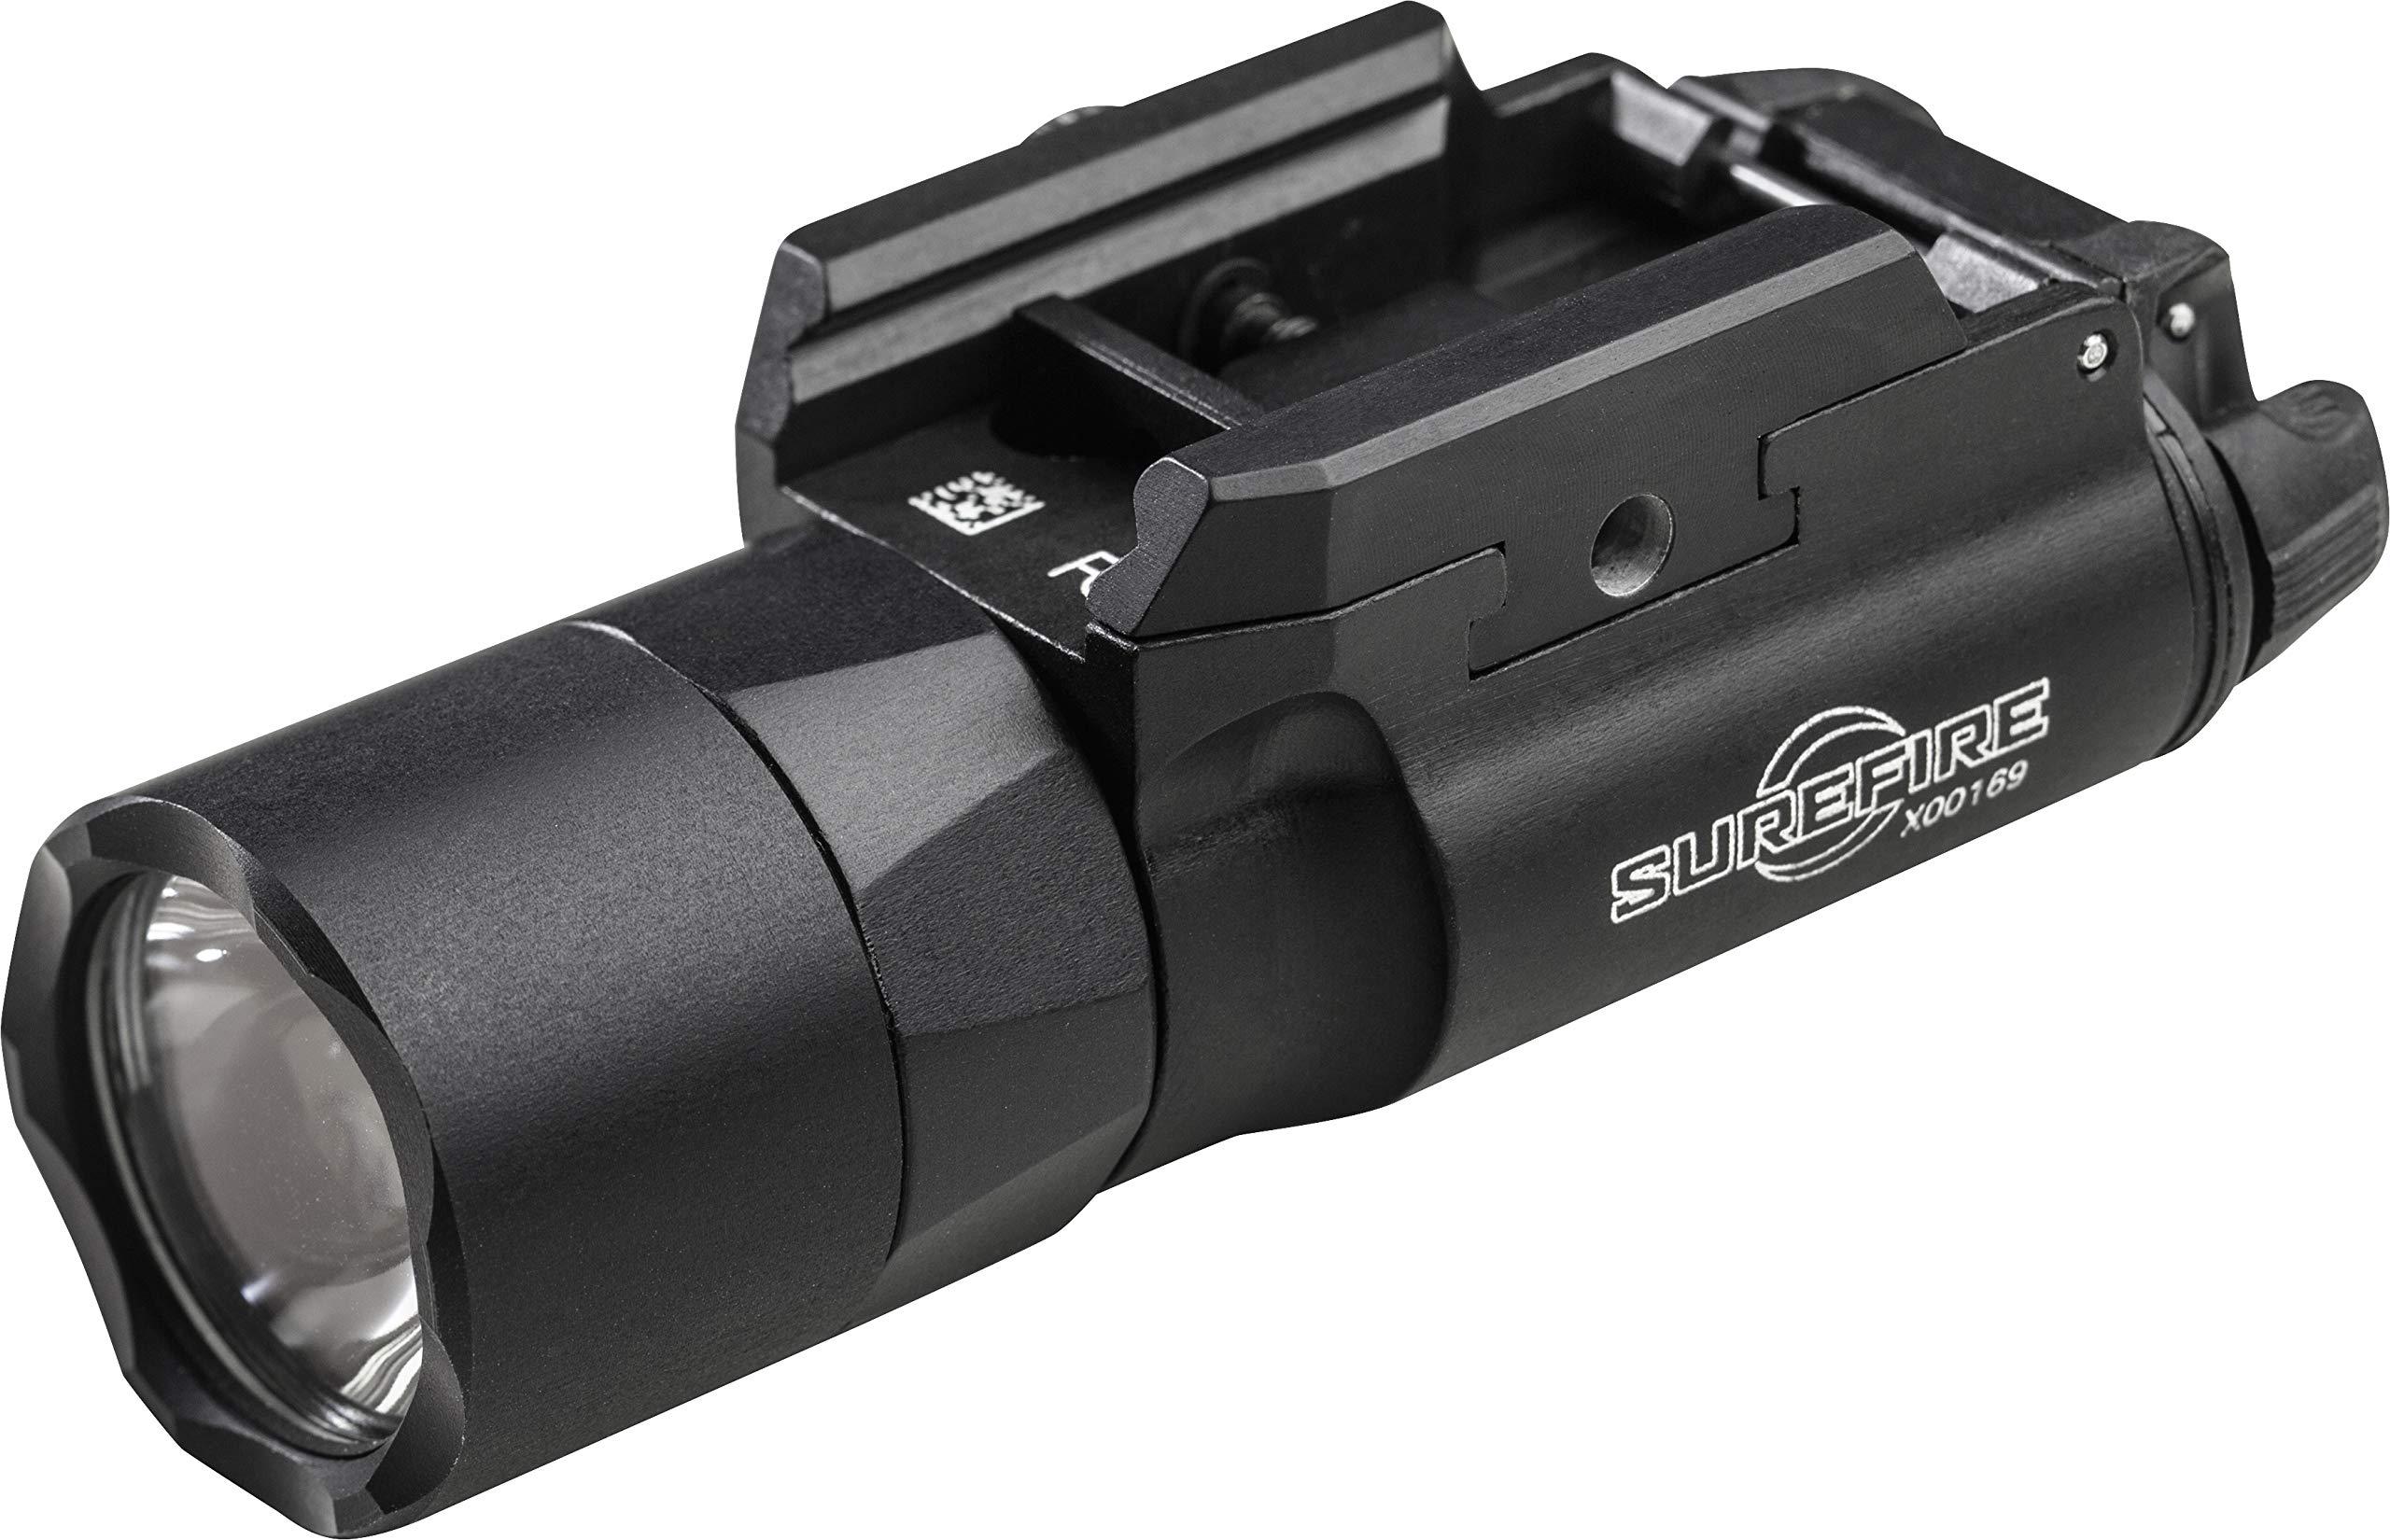 SureFire X300 Ultra LED Handgun or Long Gun Weaponlight with T-Slot Mount, Black by SureFire